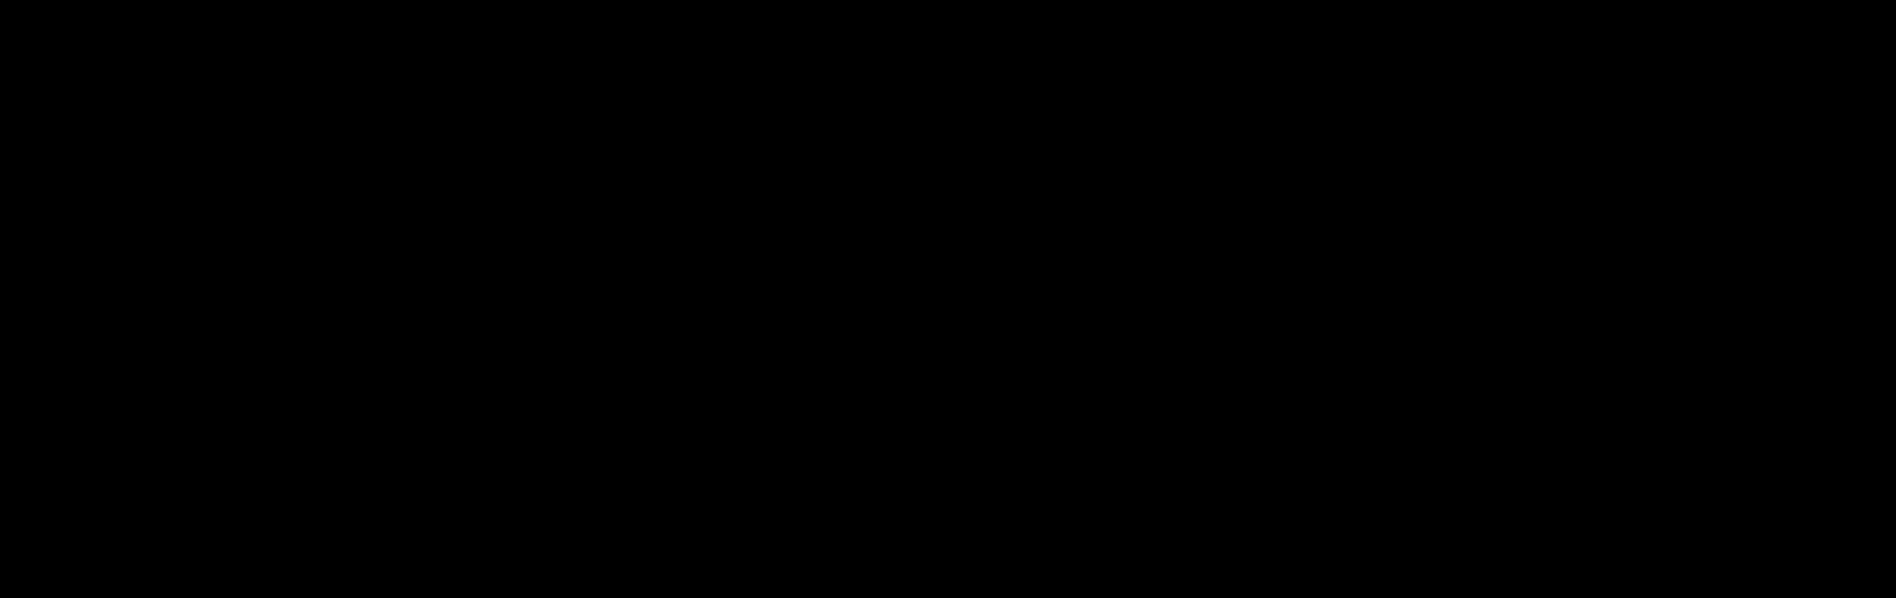 N -trans-(p-Coumaroyl)tyramine